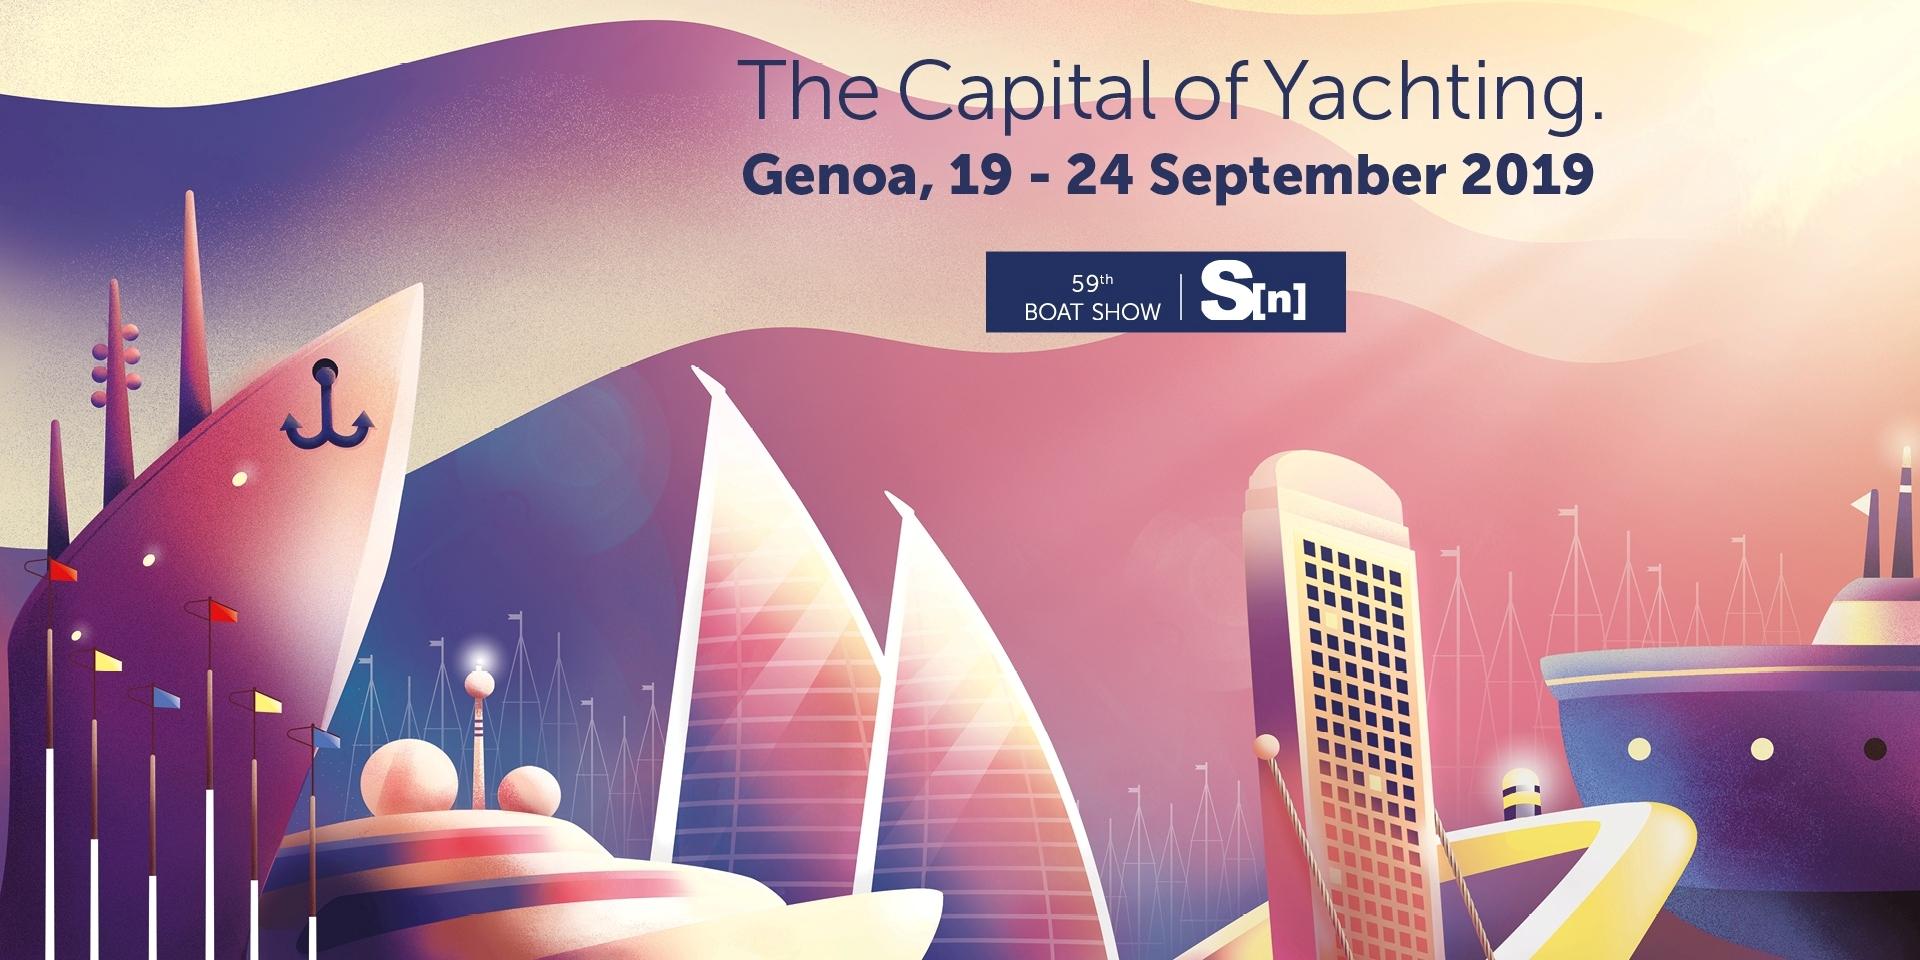 Genoa Boat show 2019 - 01R Ingl